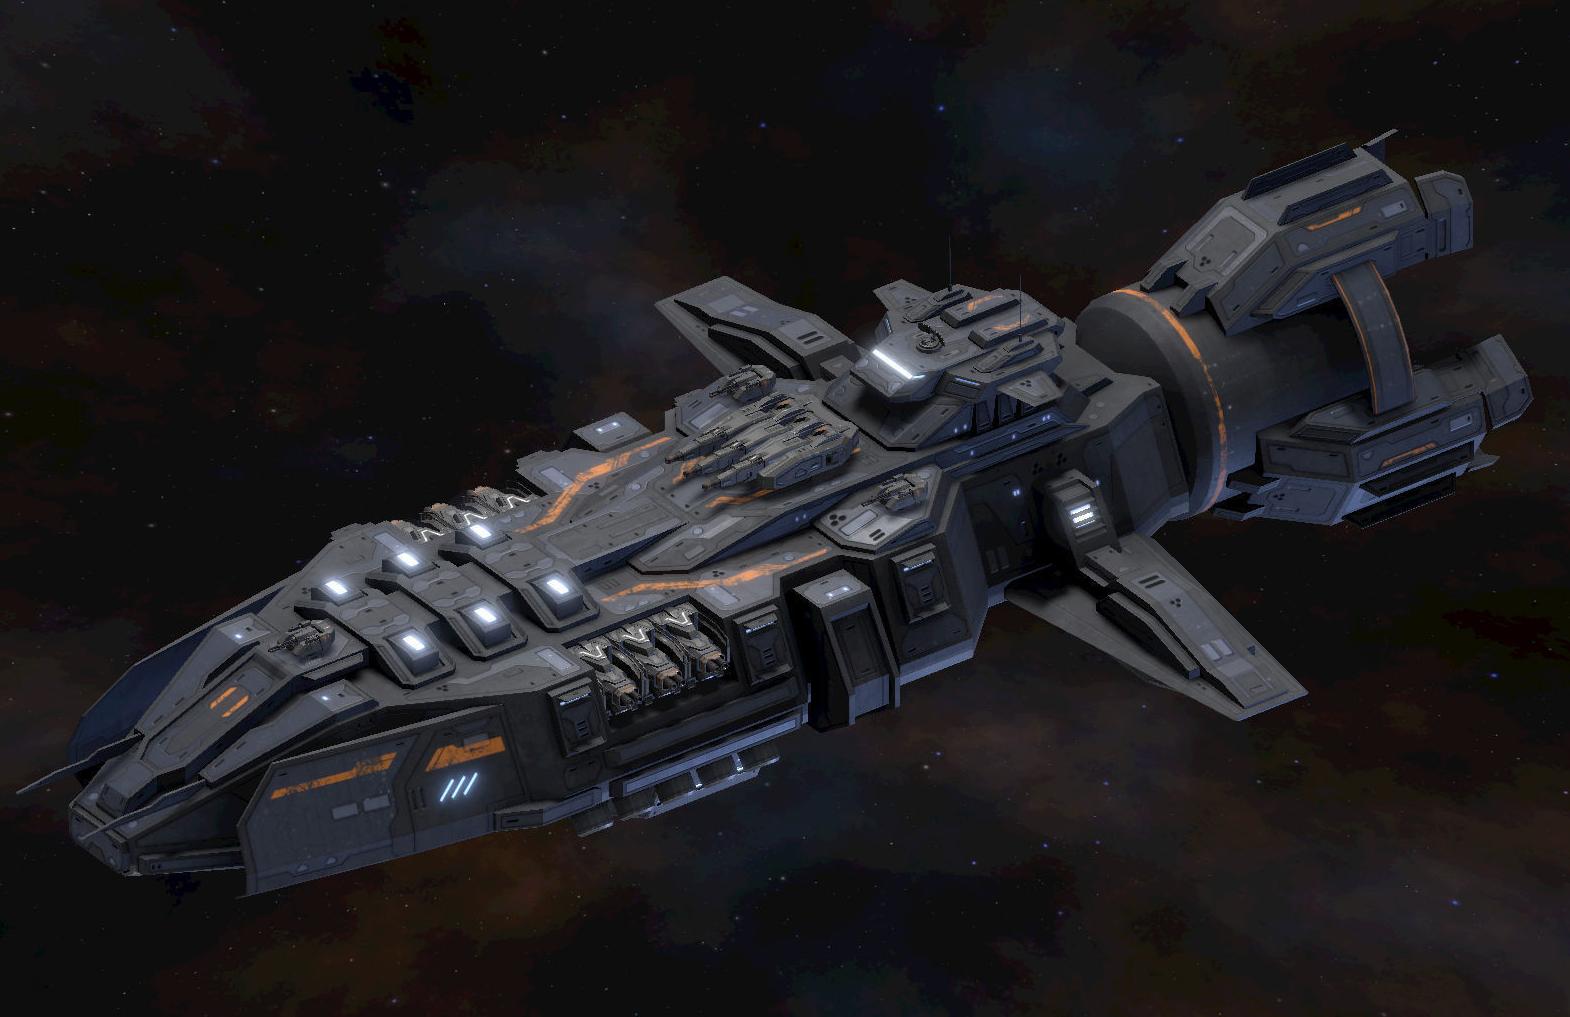 Romulus-class heavy corvette